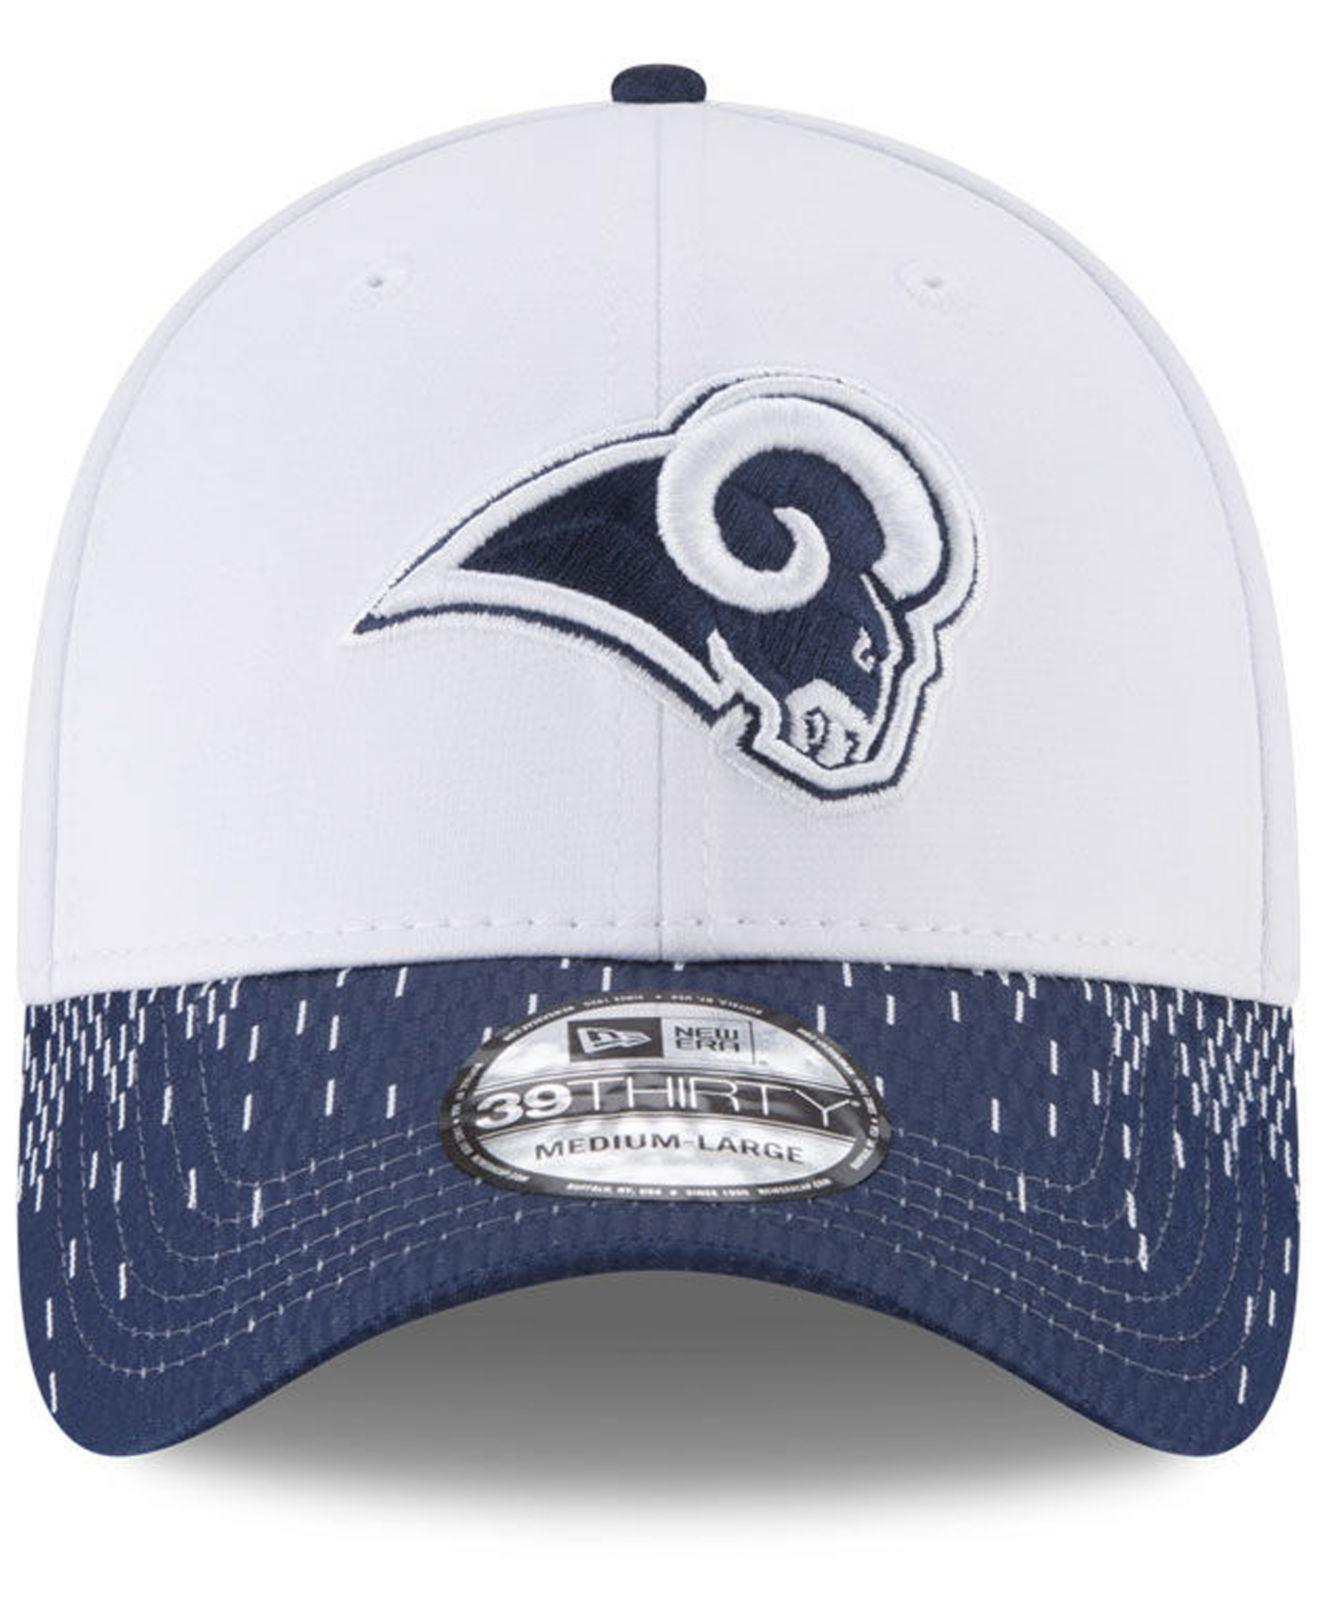 f49f7b493b1 Lyst - Ktz Los Angeles Rams Equalizer 39thirty Cap in Blue for Men